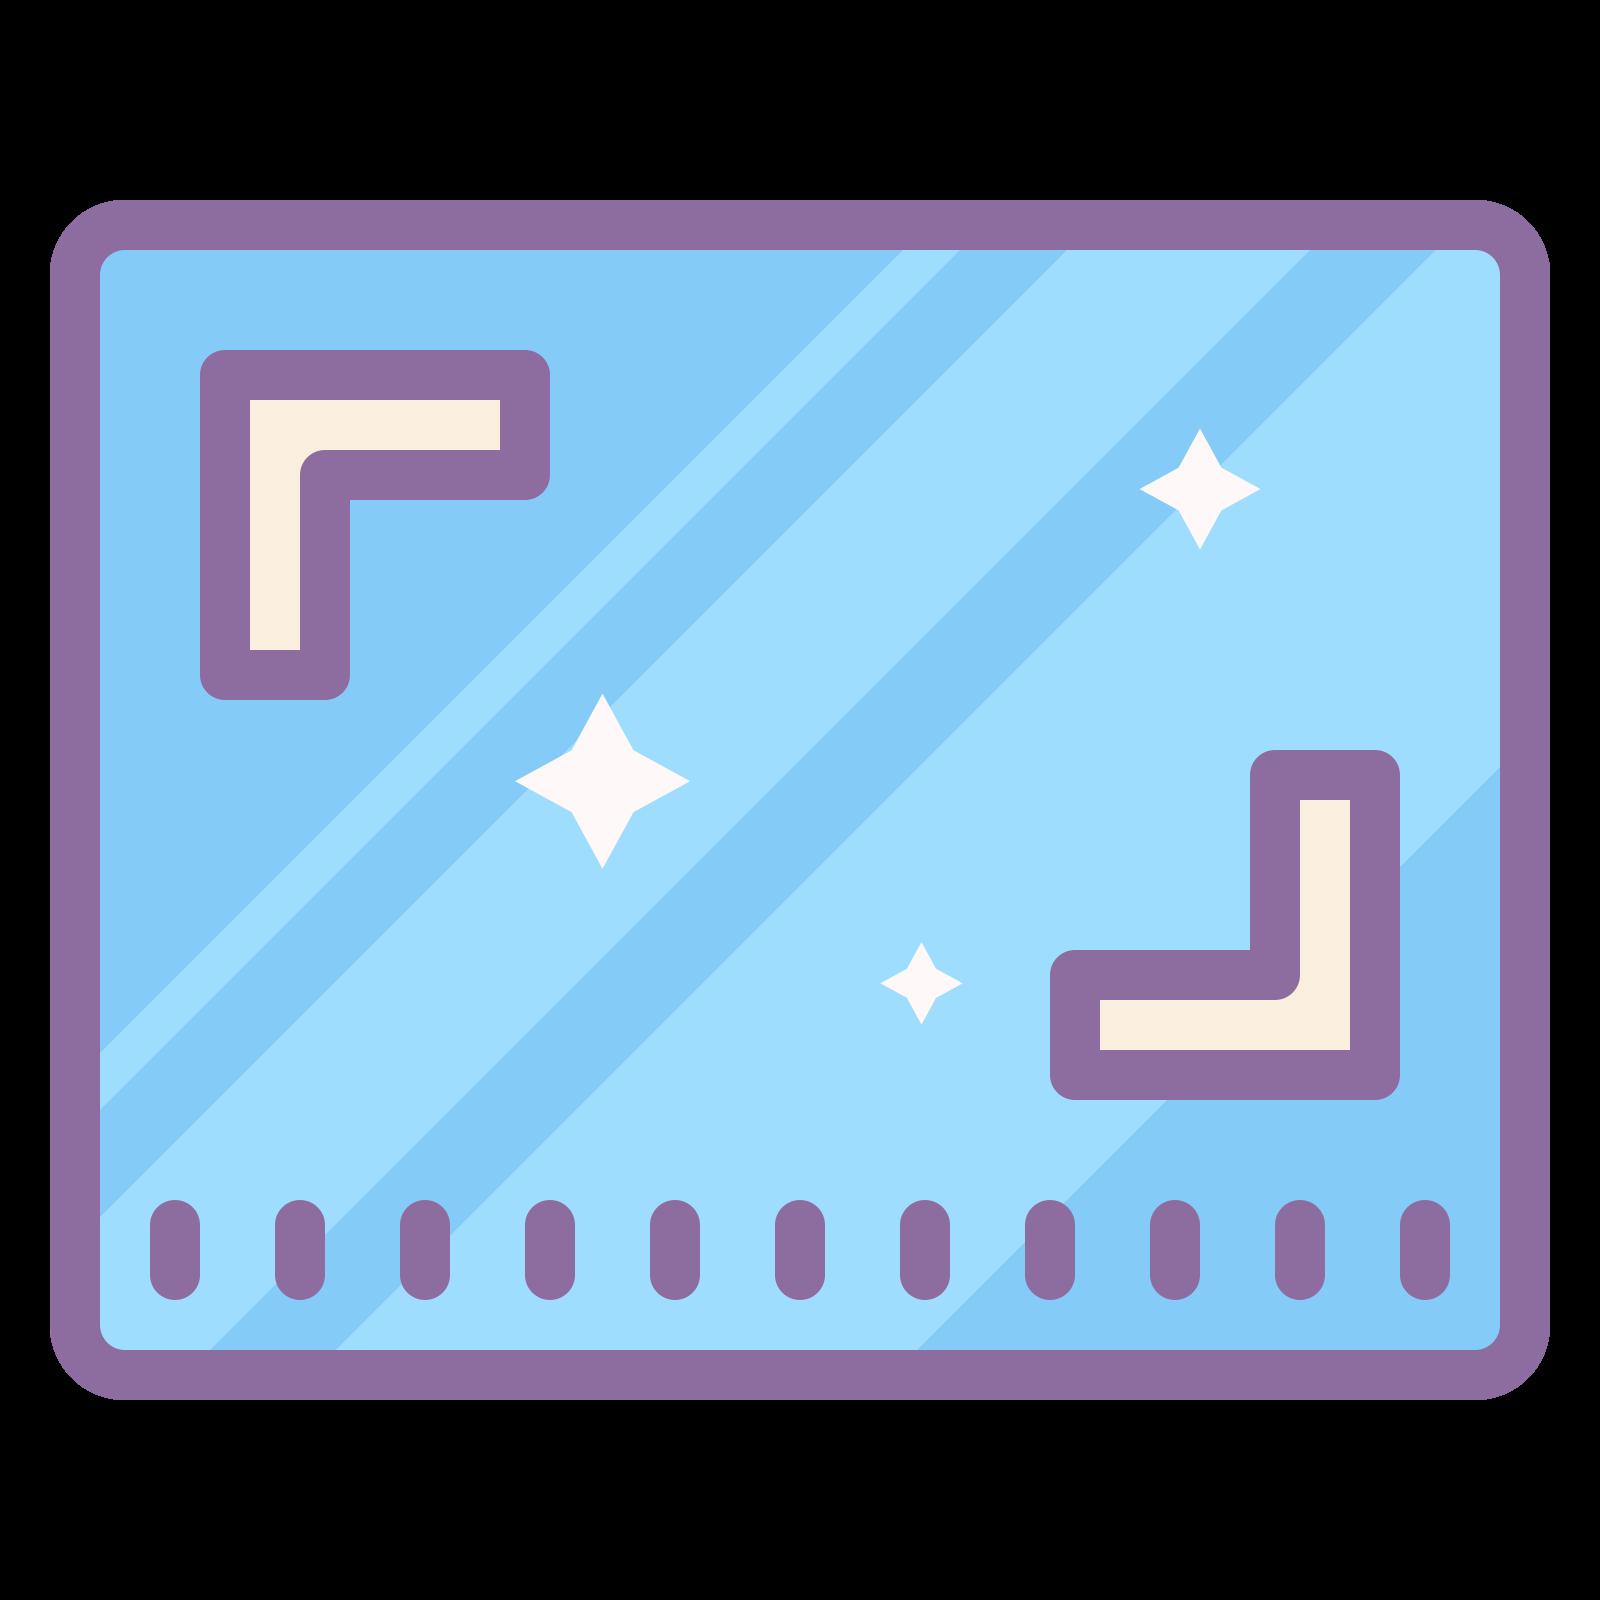 Proporcje obrazu icon